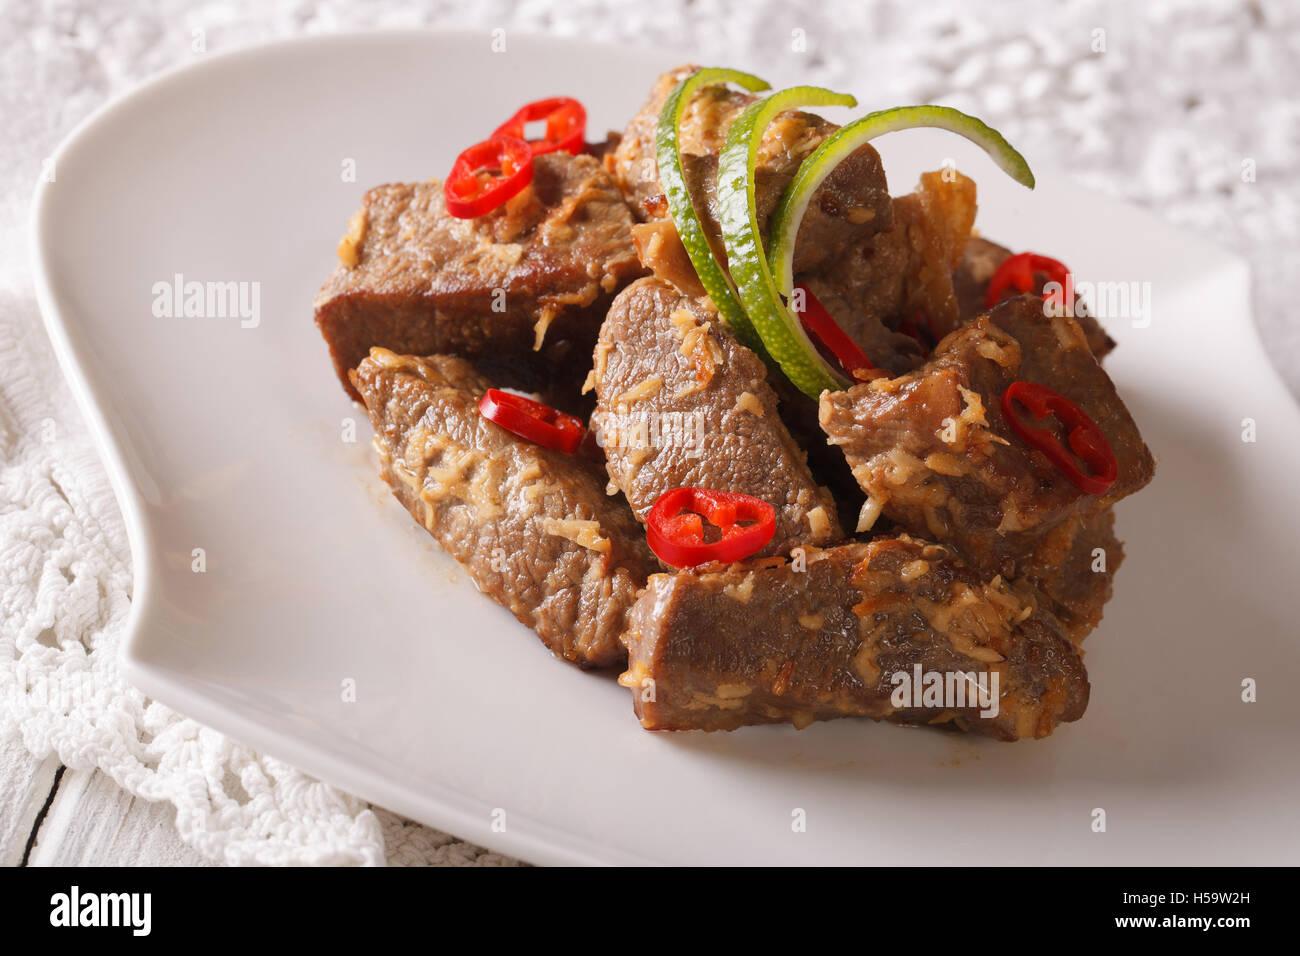 Indonesian cuisine: Beef rendang stewed in coconut milk with